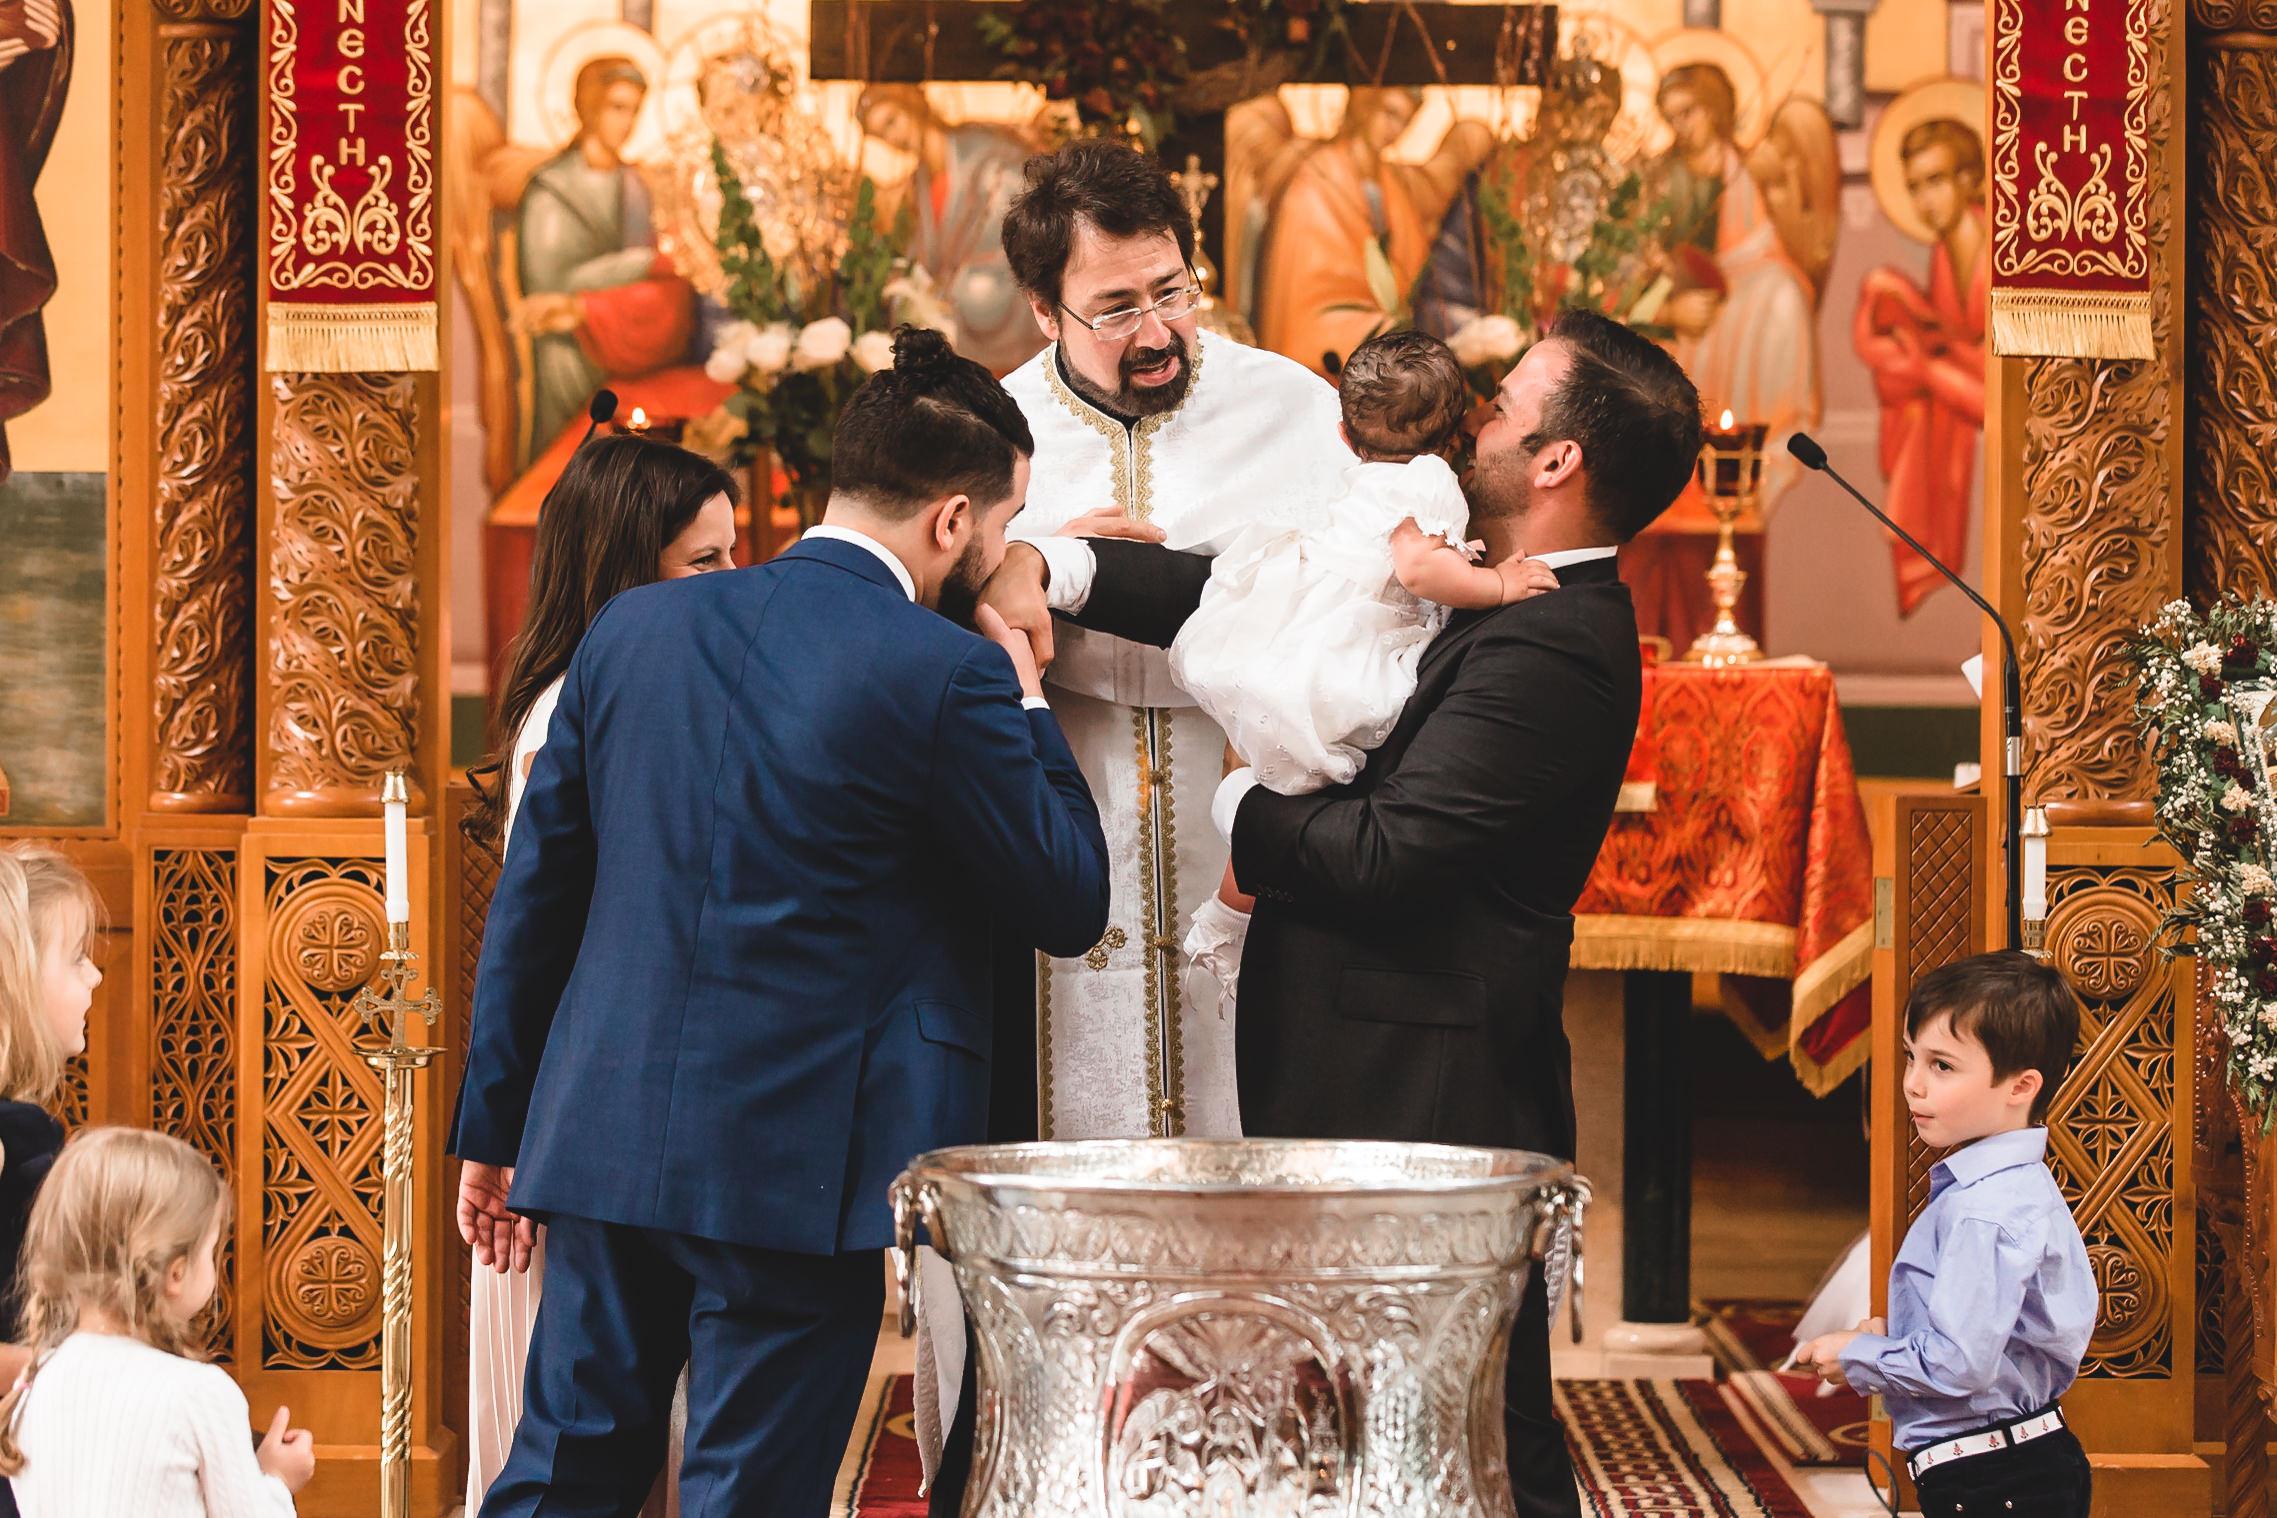 Kimisis Tis Theotokou baptism holmdel nj daniel nydick (31 of 36).jpg